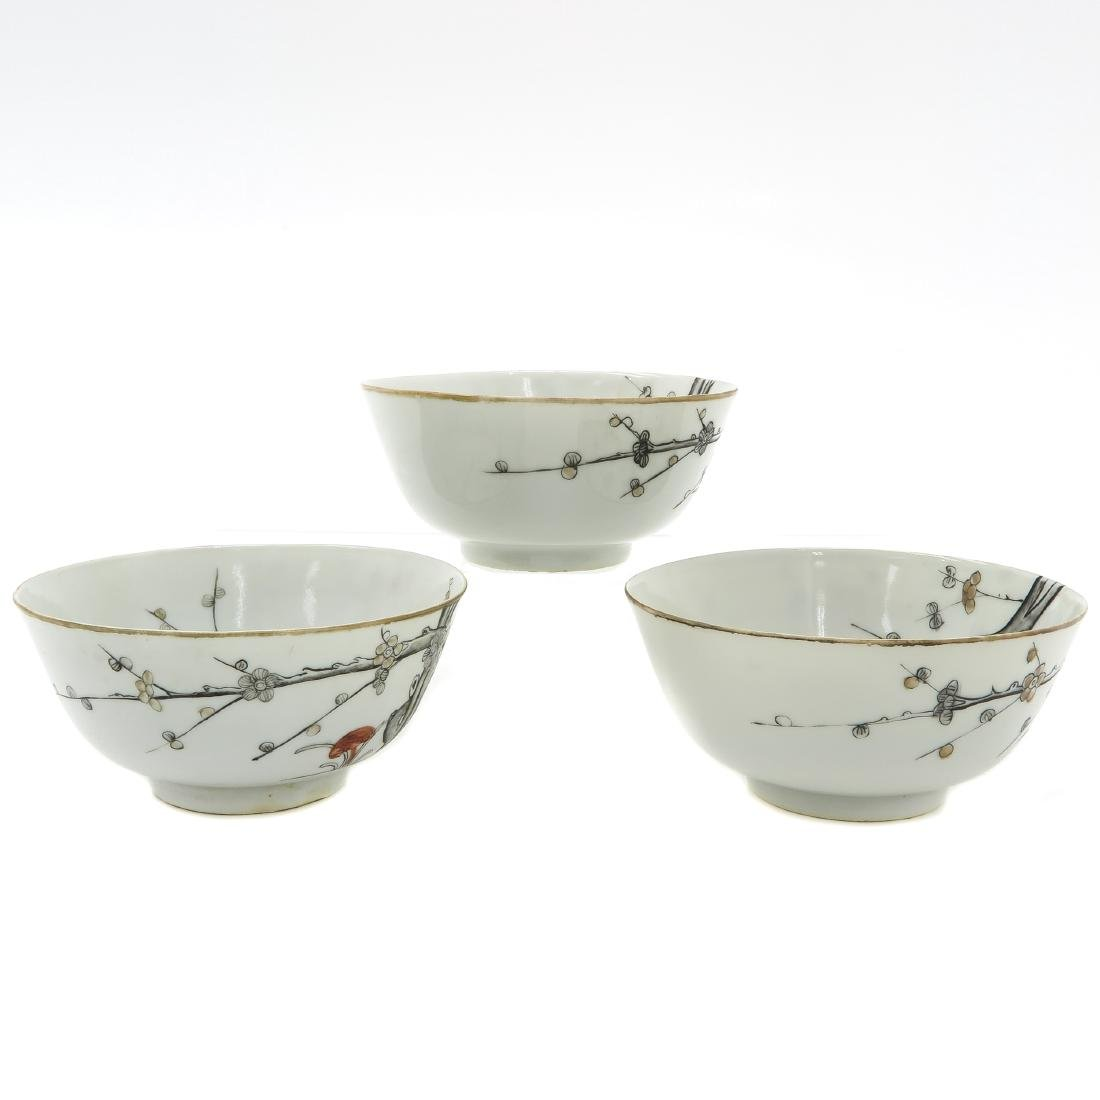 Lot of 3 Bowls - 4